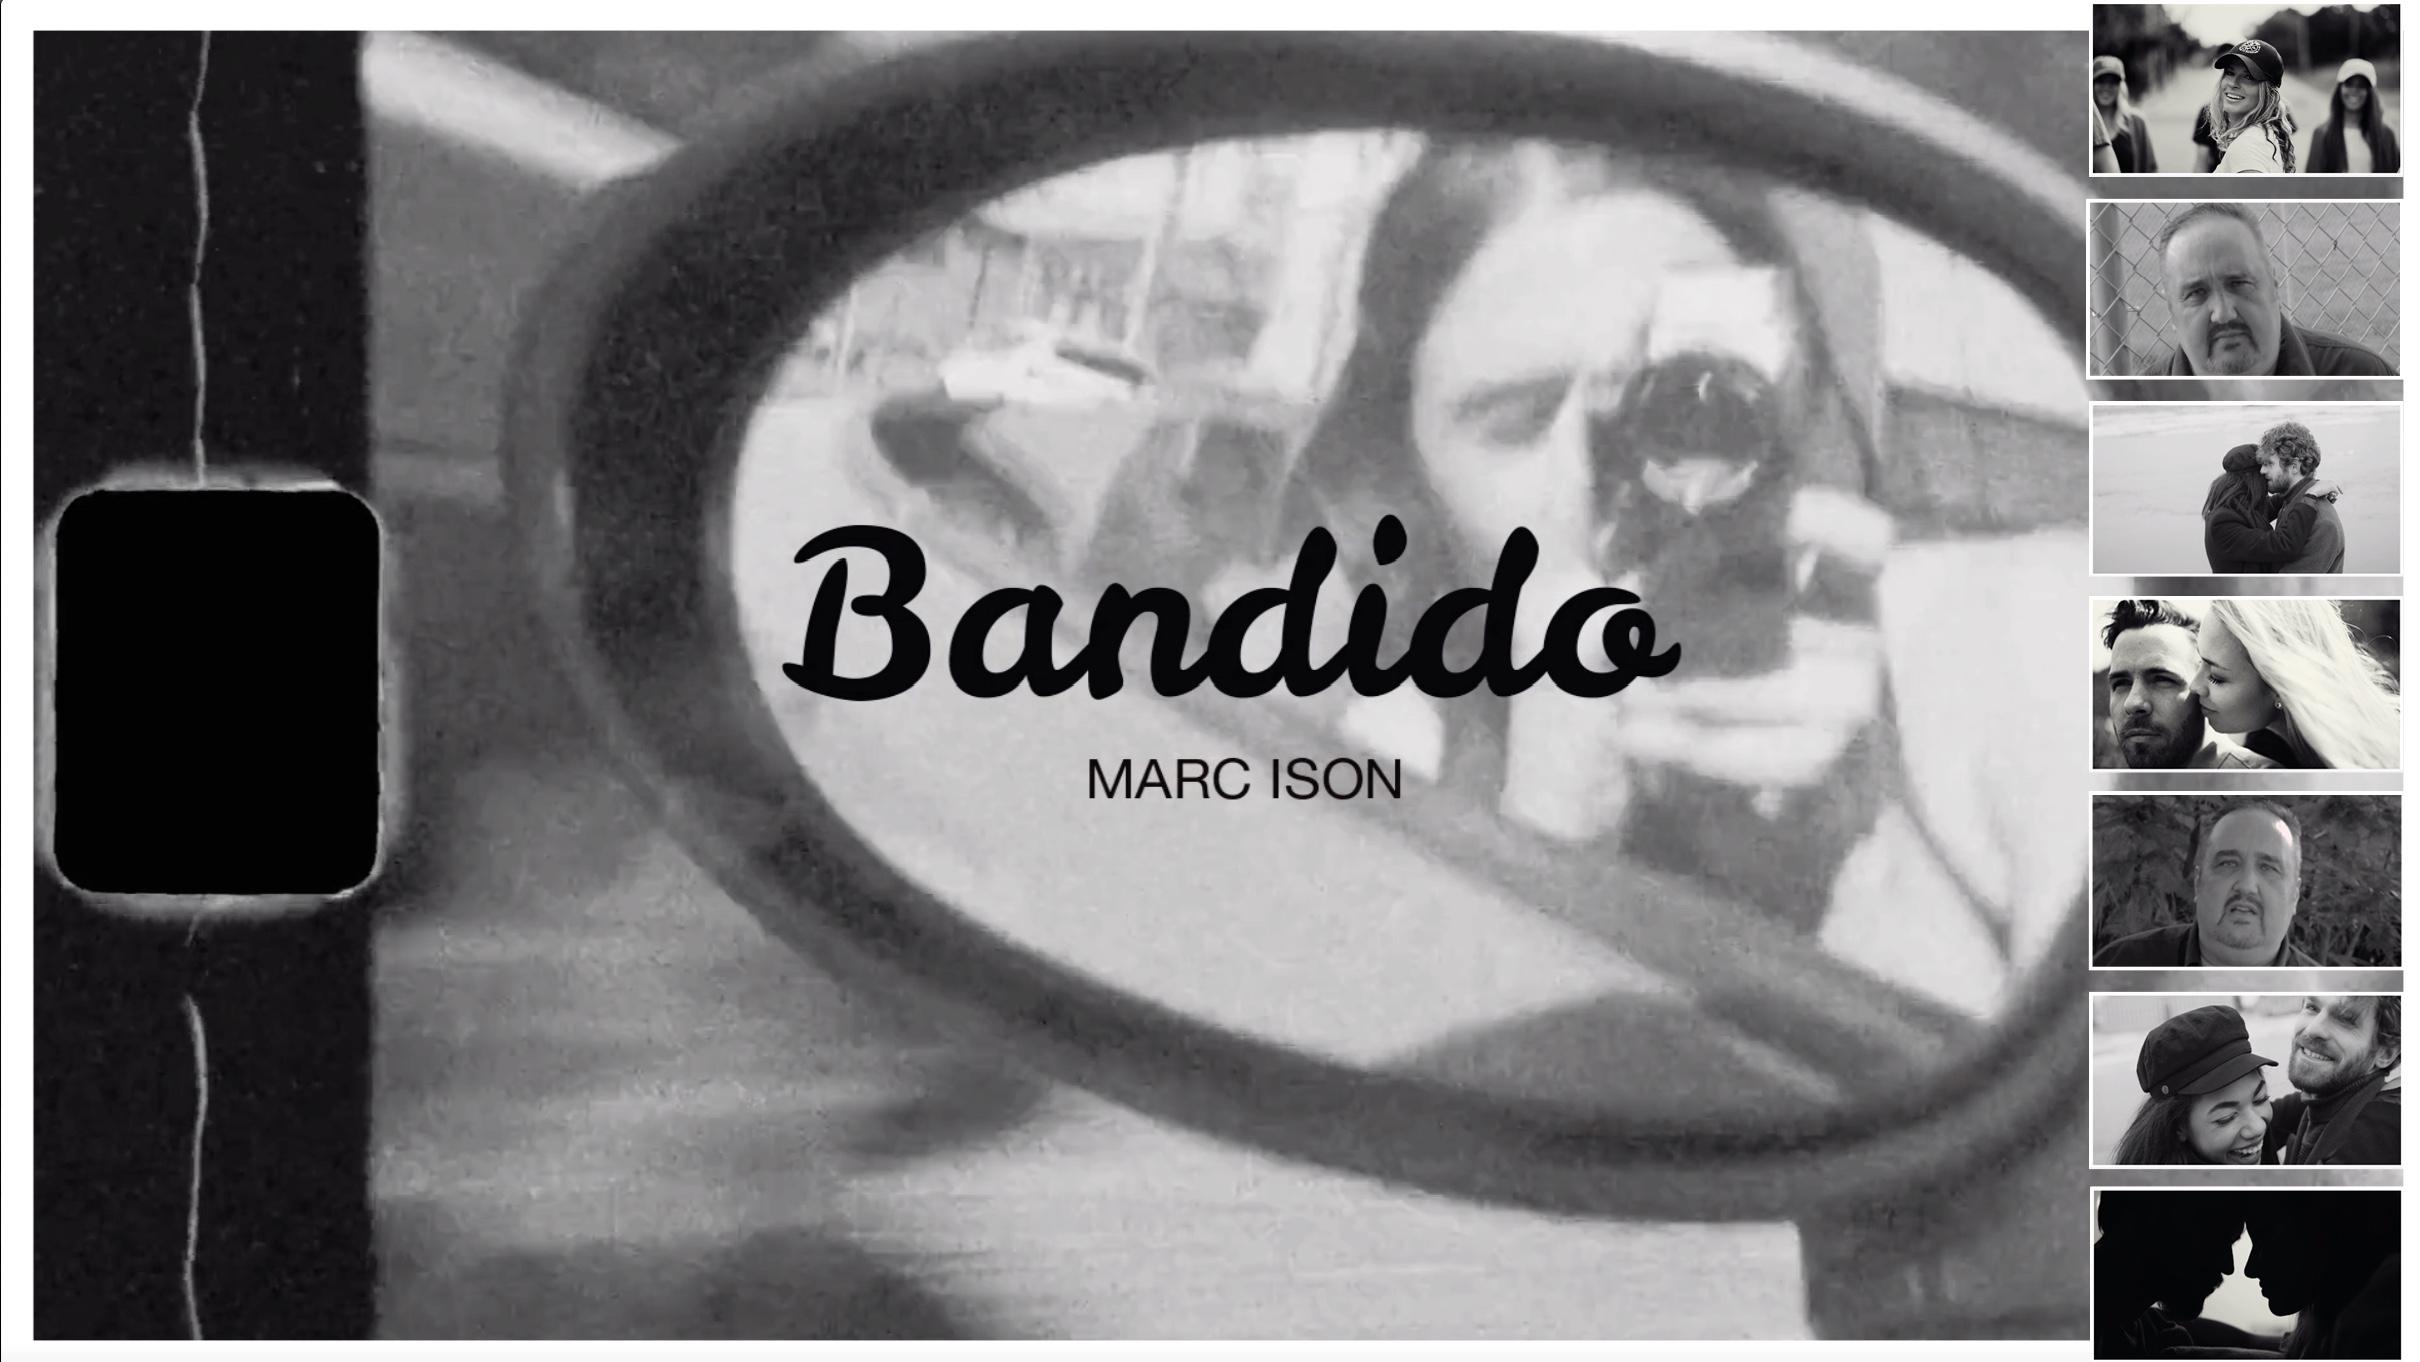 Bandido - Marc Ison Thumbnail